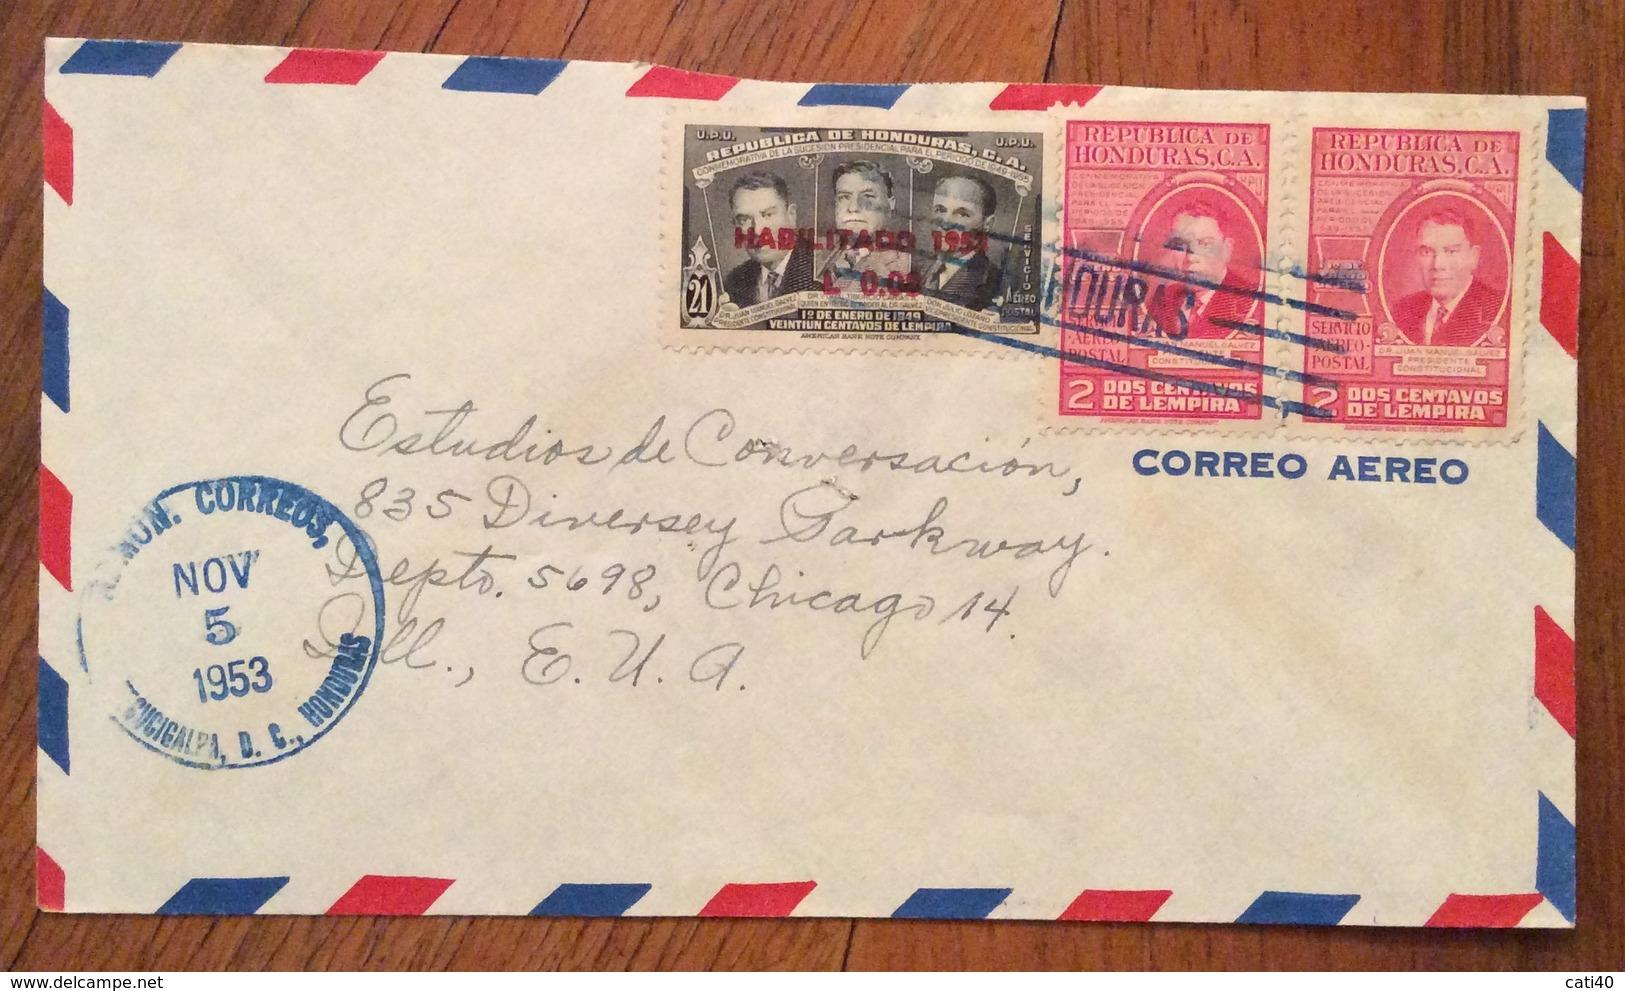 POSTA AEREA PAR AVION  HONDURAS  U.S.A.   FROM  TAGUCIGALPA   TO CHICAGO  THE  5/11/53 - Honduras